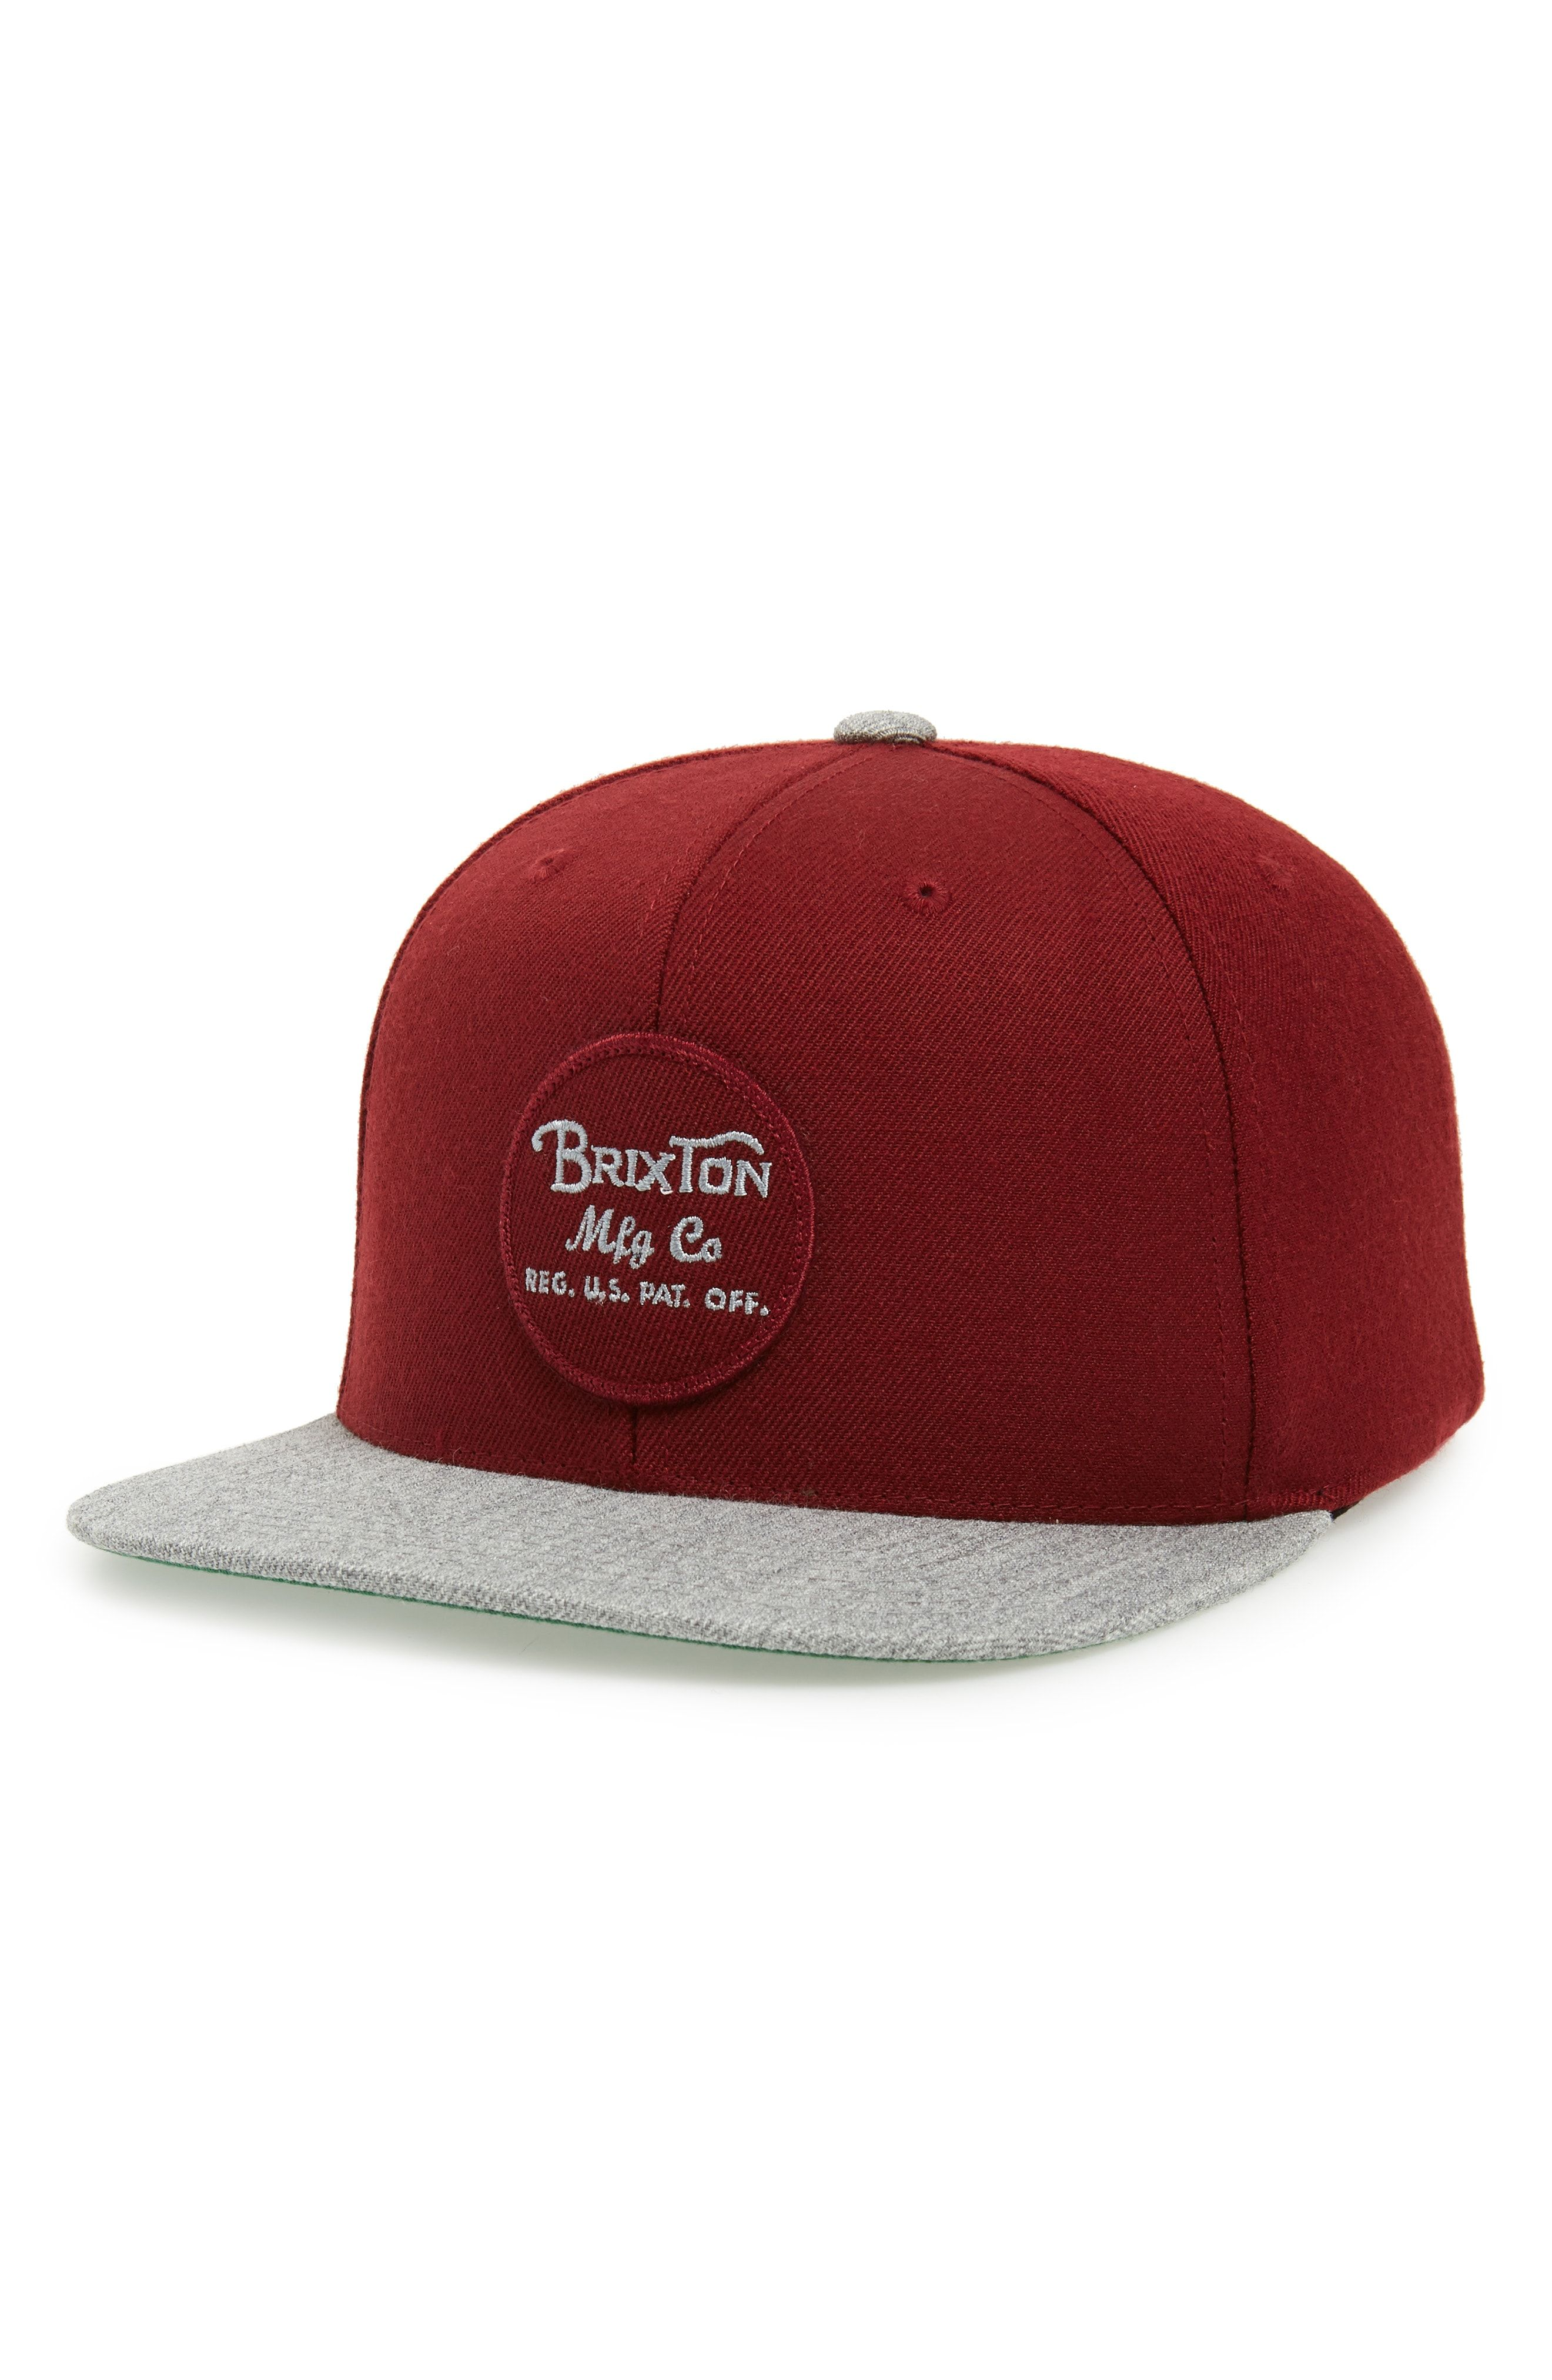 online store 0d0a8 7cbb6 ... norway brixton wheeler snapback cap red. brixton brixton snapback cap  b5e52 8a211